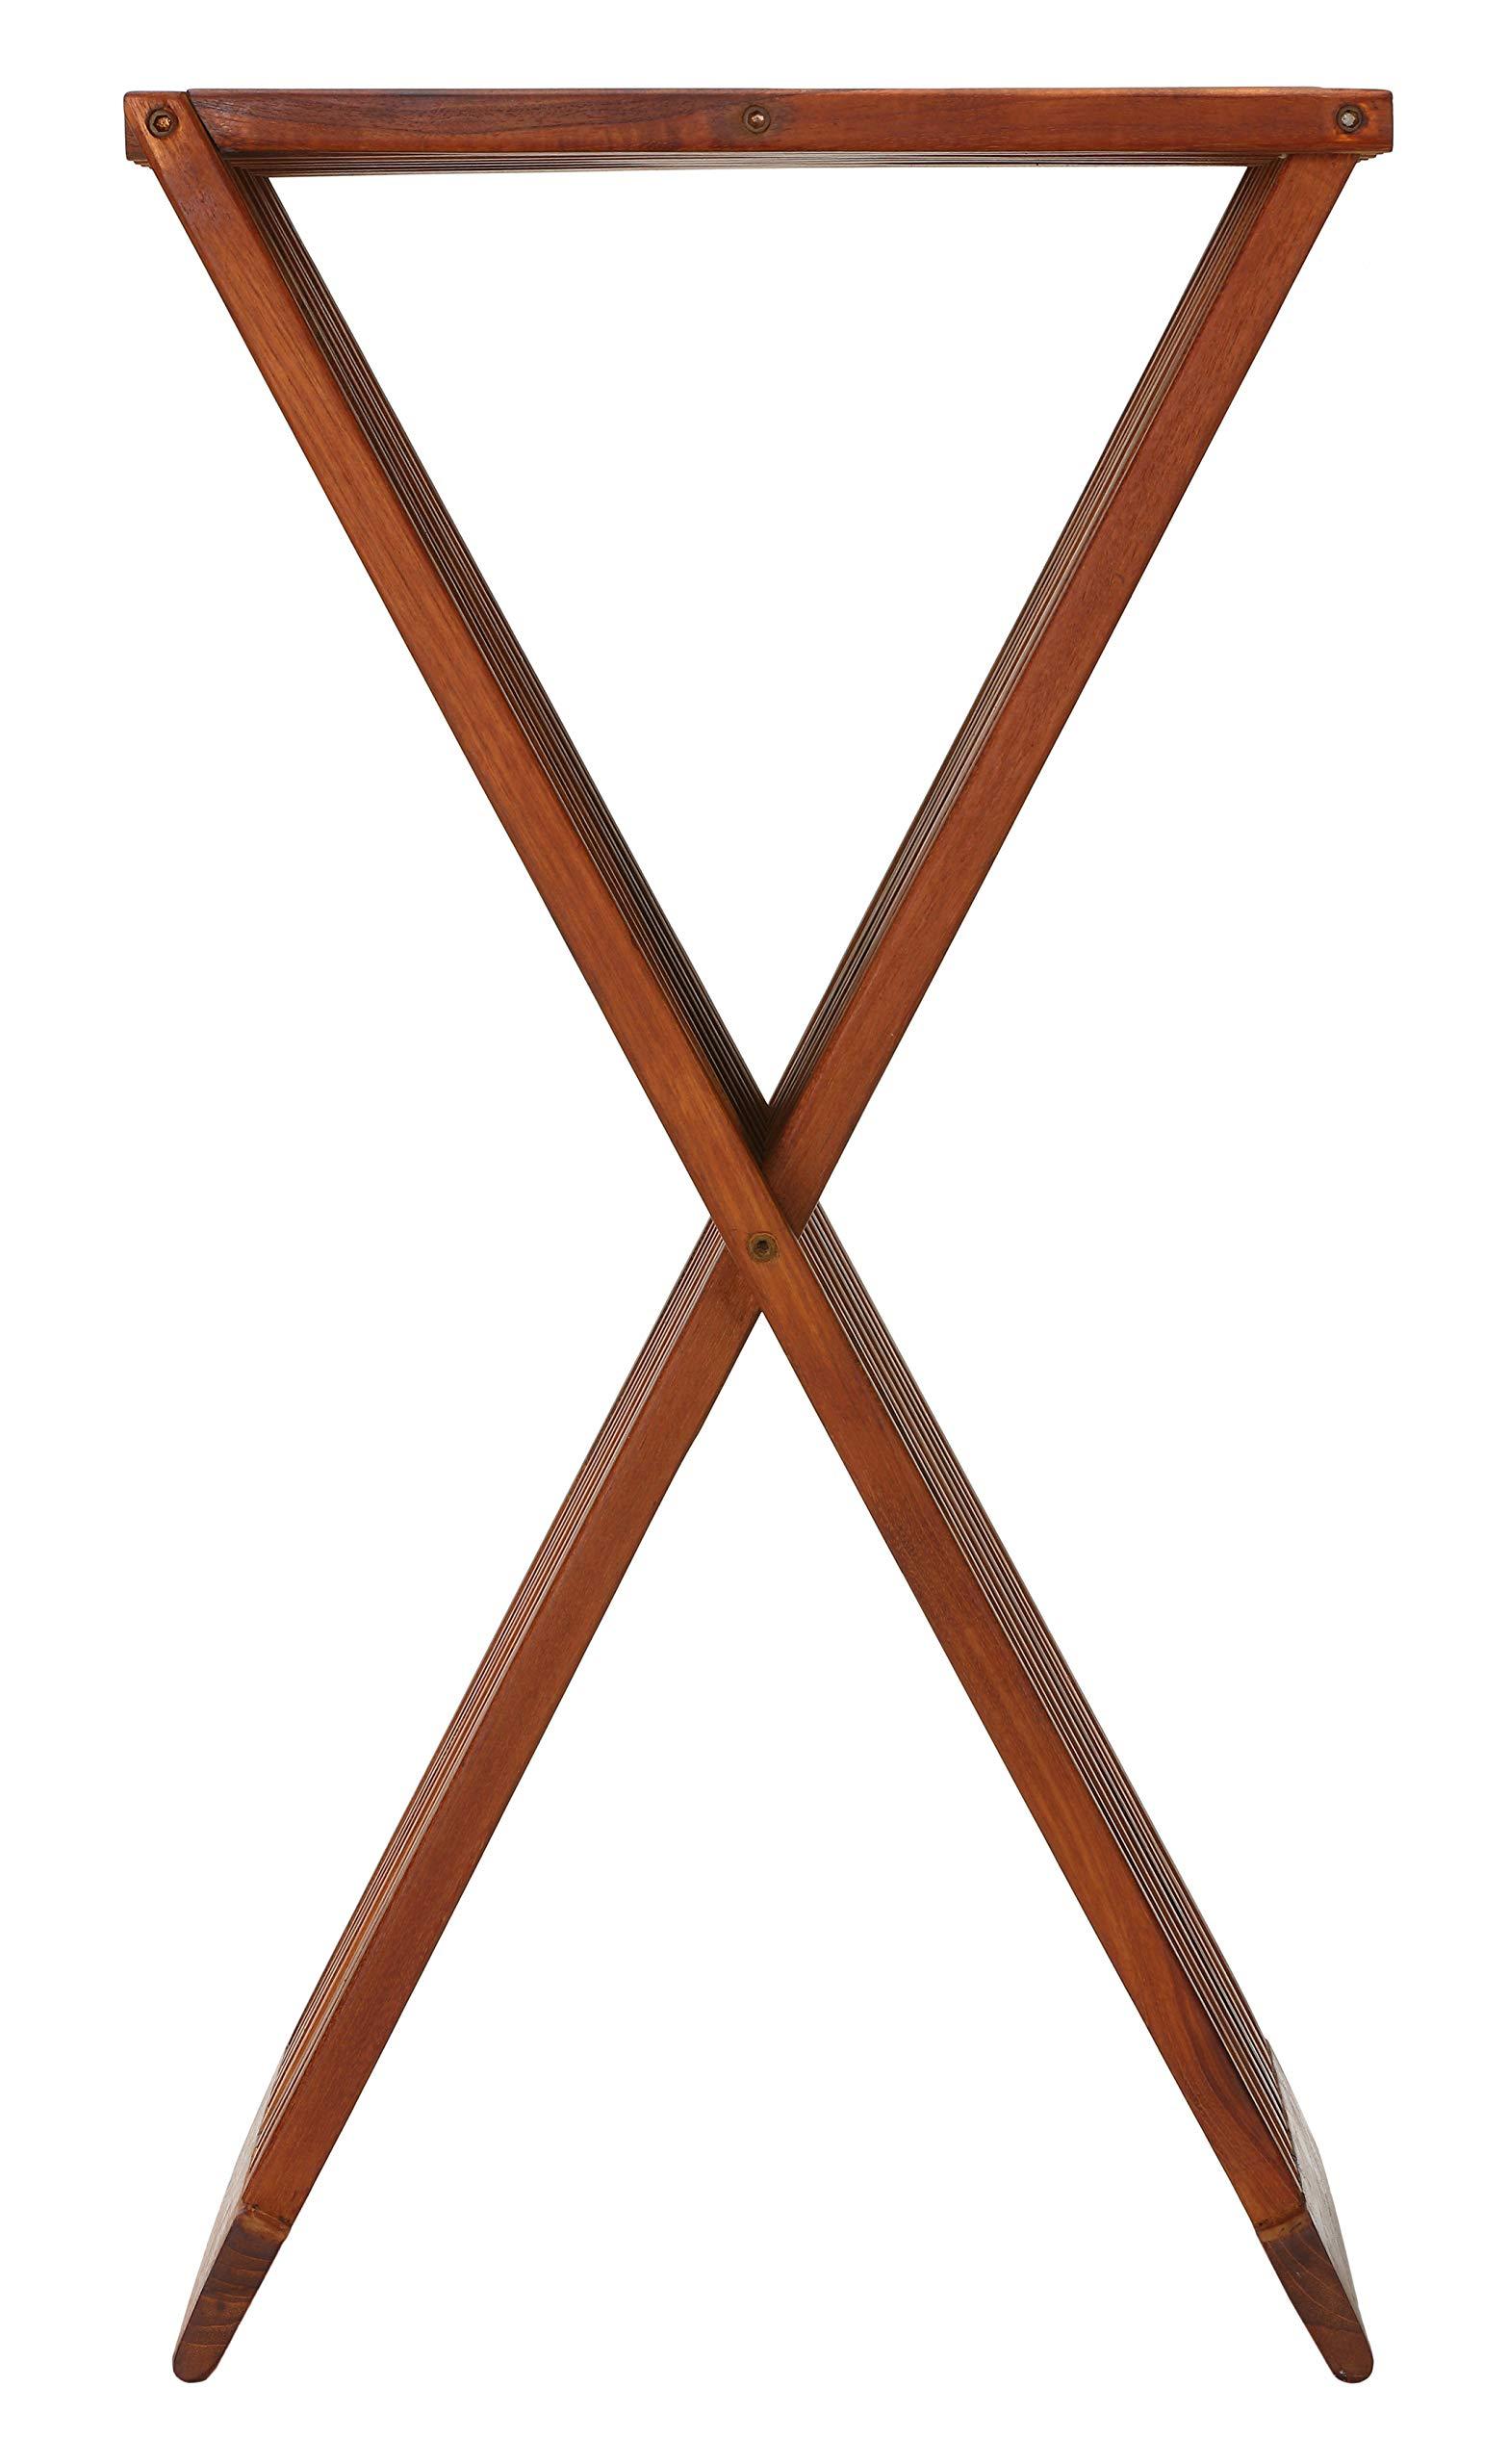 Bare Decor Taj Folding Plantstand Pedestal Table in Solid Teak Wood, Brown